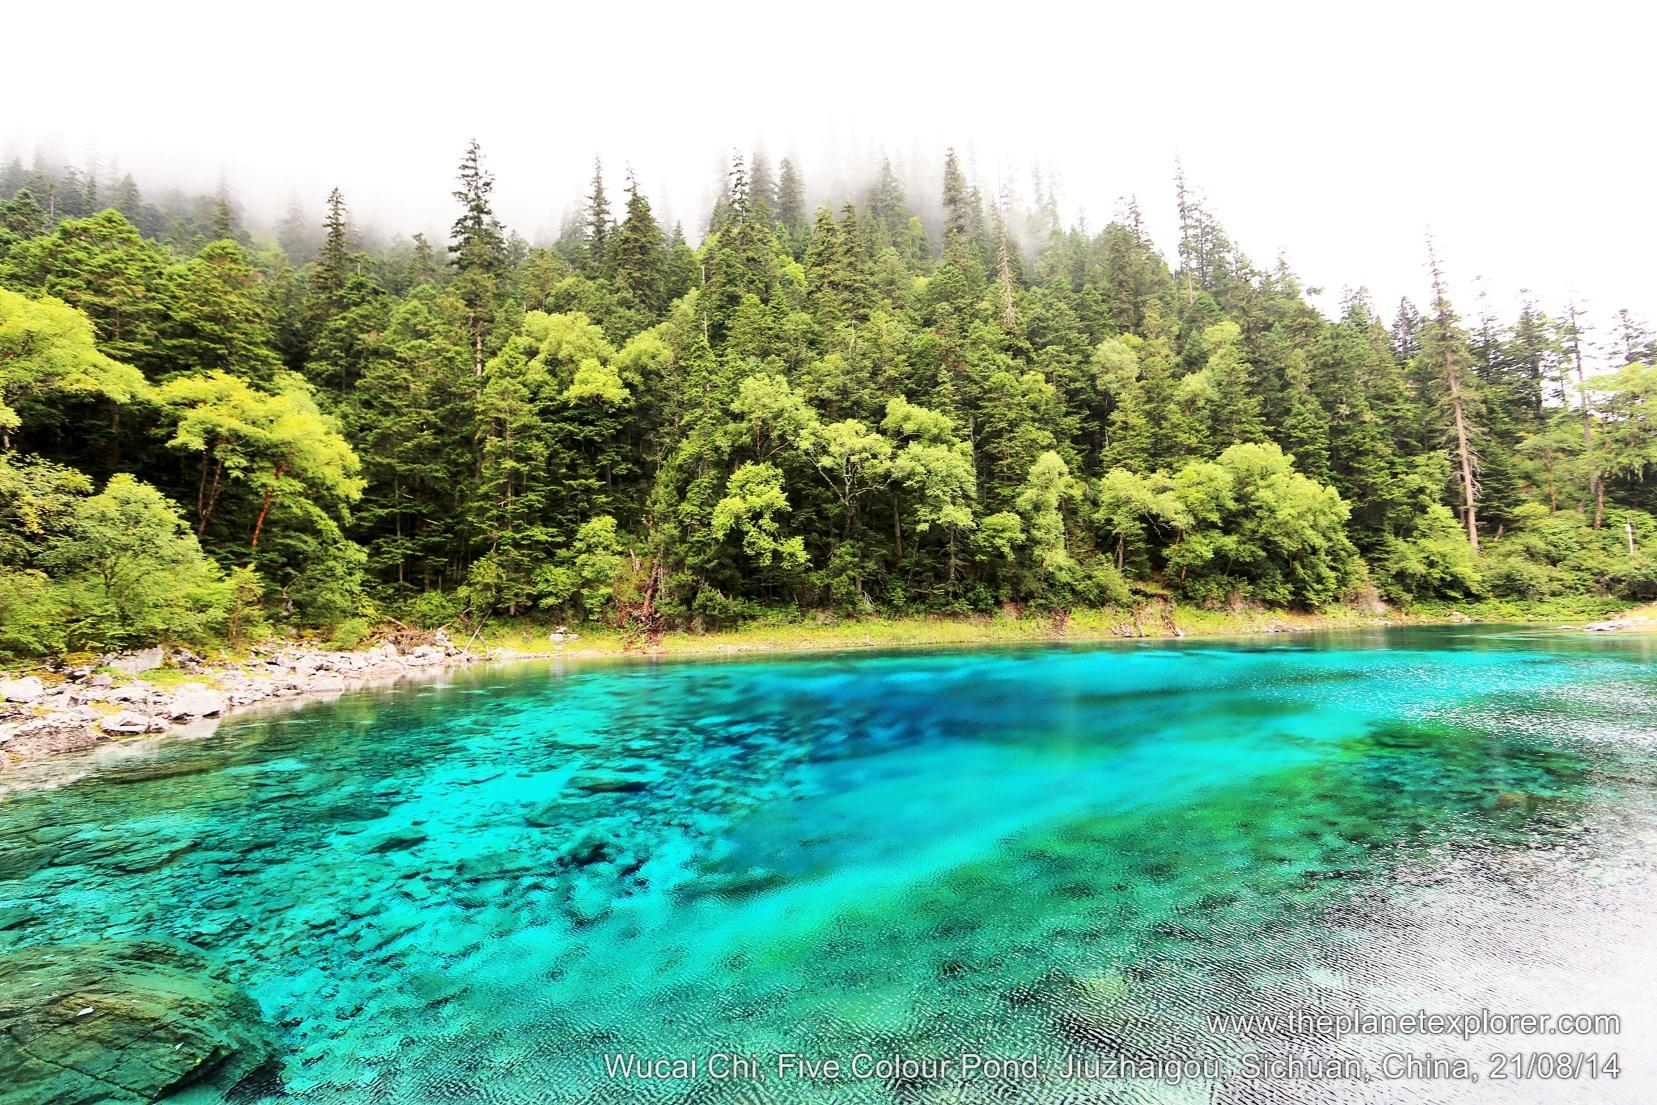 2014-08-21_1131_china_sichuan_jiuzhaigou_five-colour-pond-wucai-chi_lr_nw